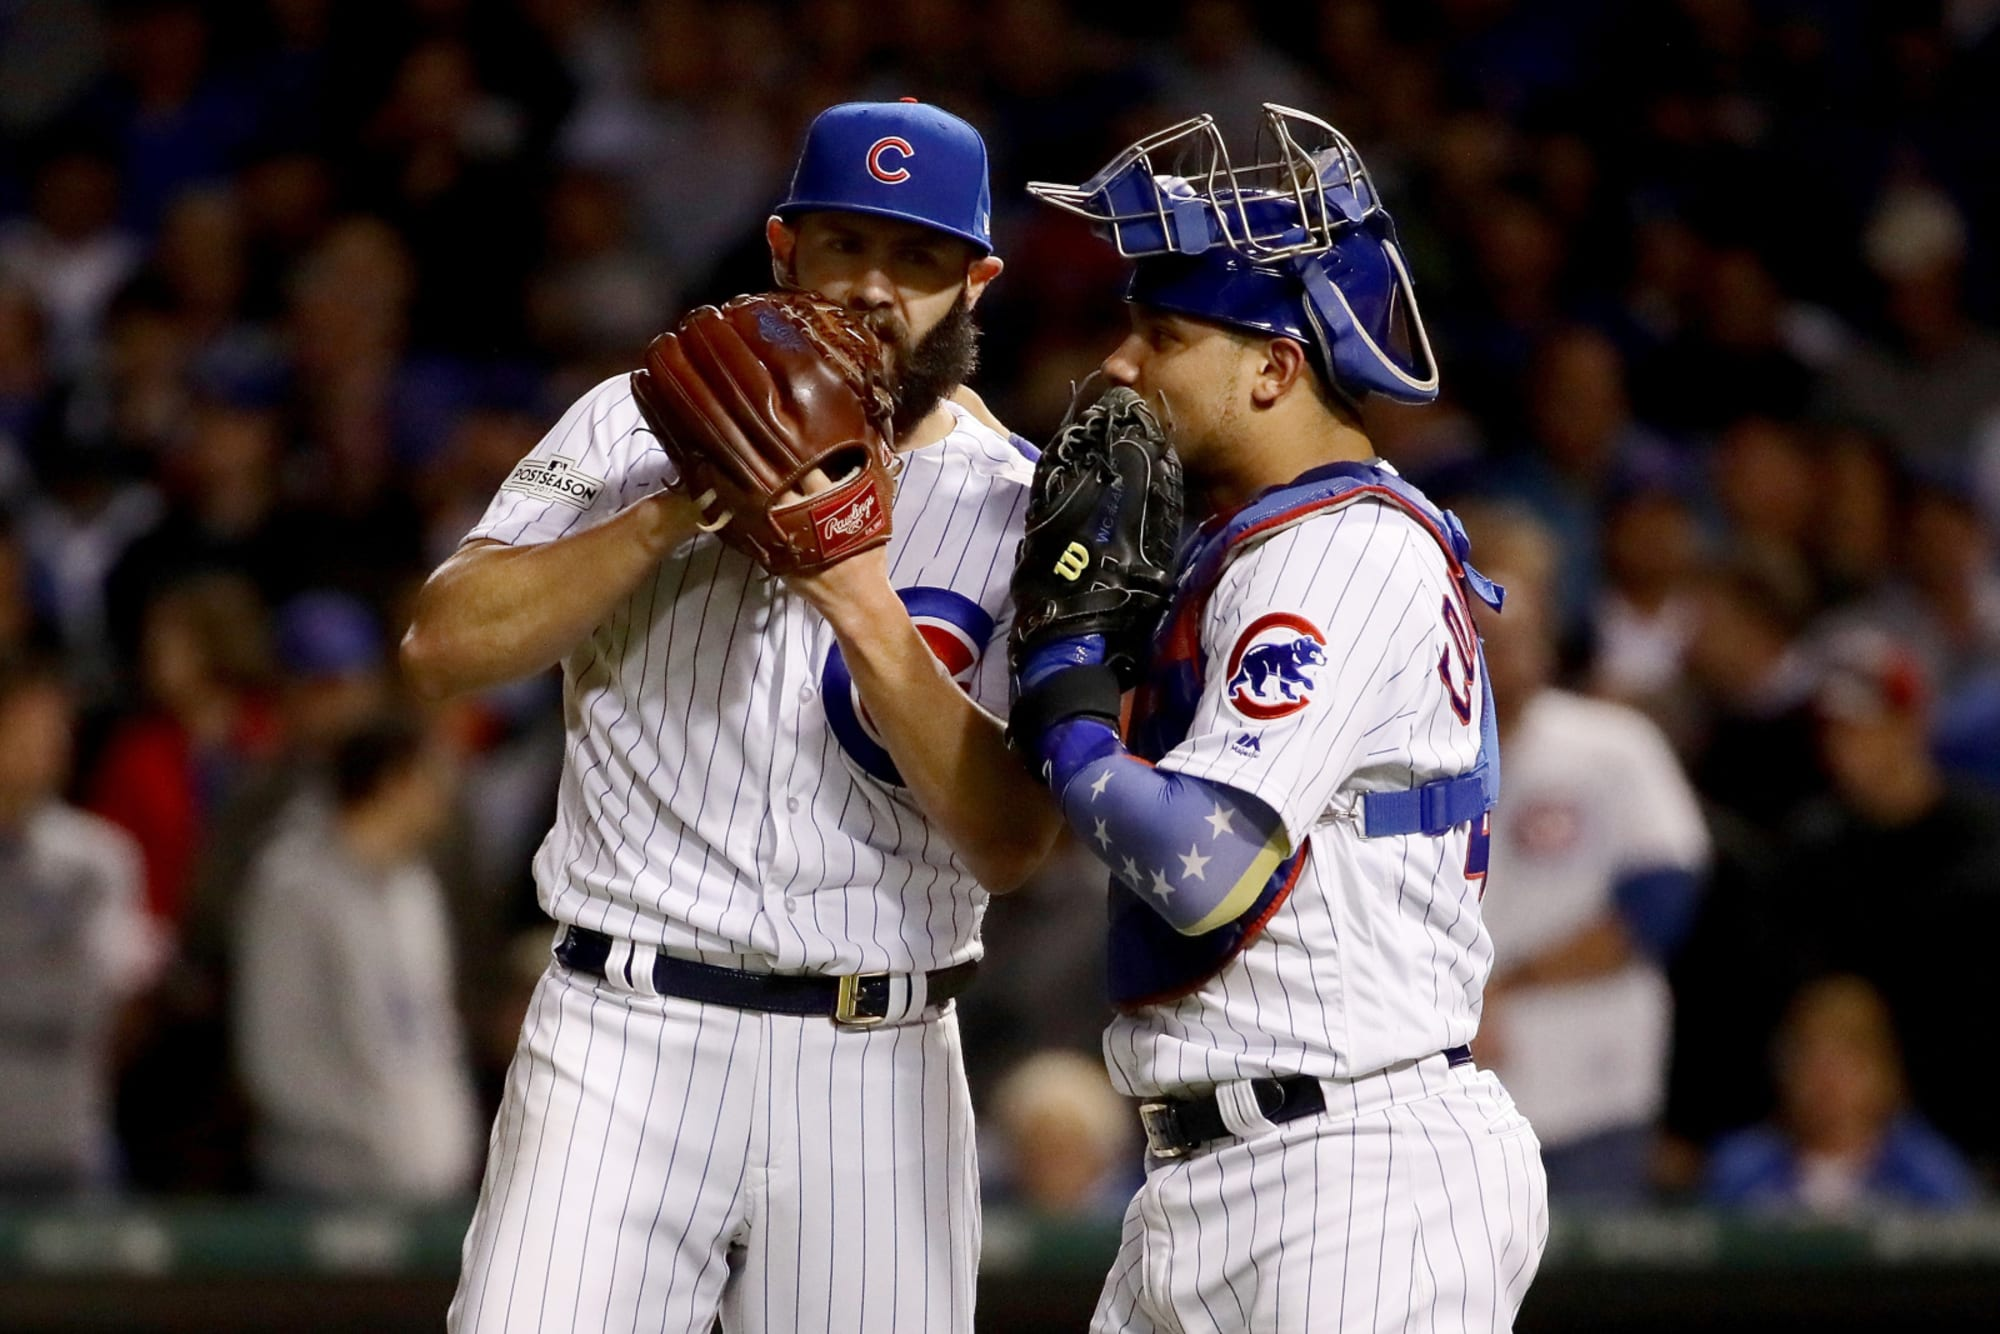 Cubs: Jake Arrieta has unbelievably high praise for Willson Contreras